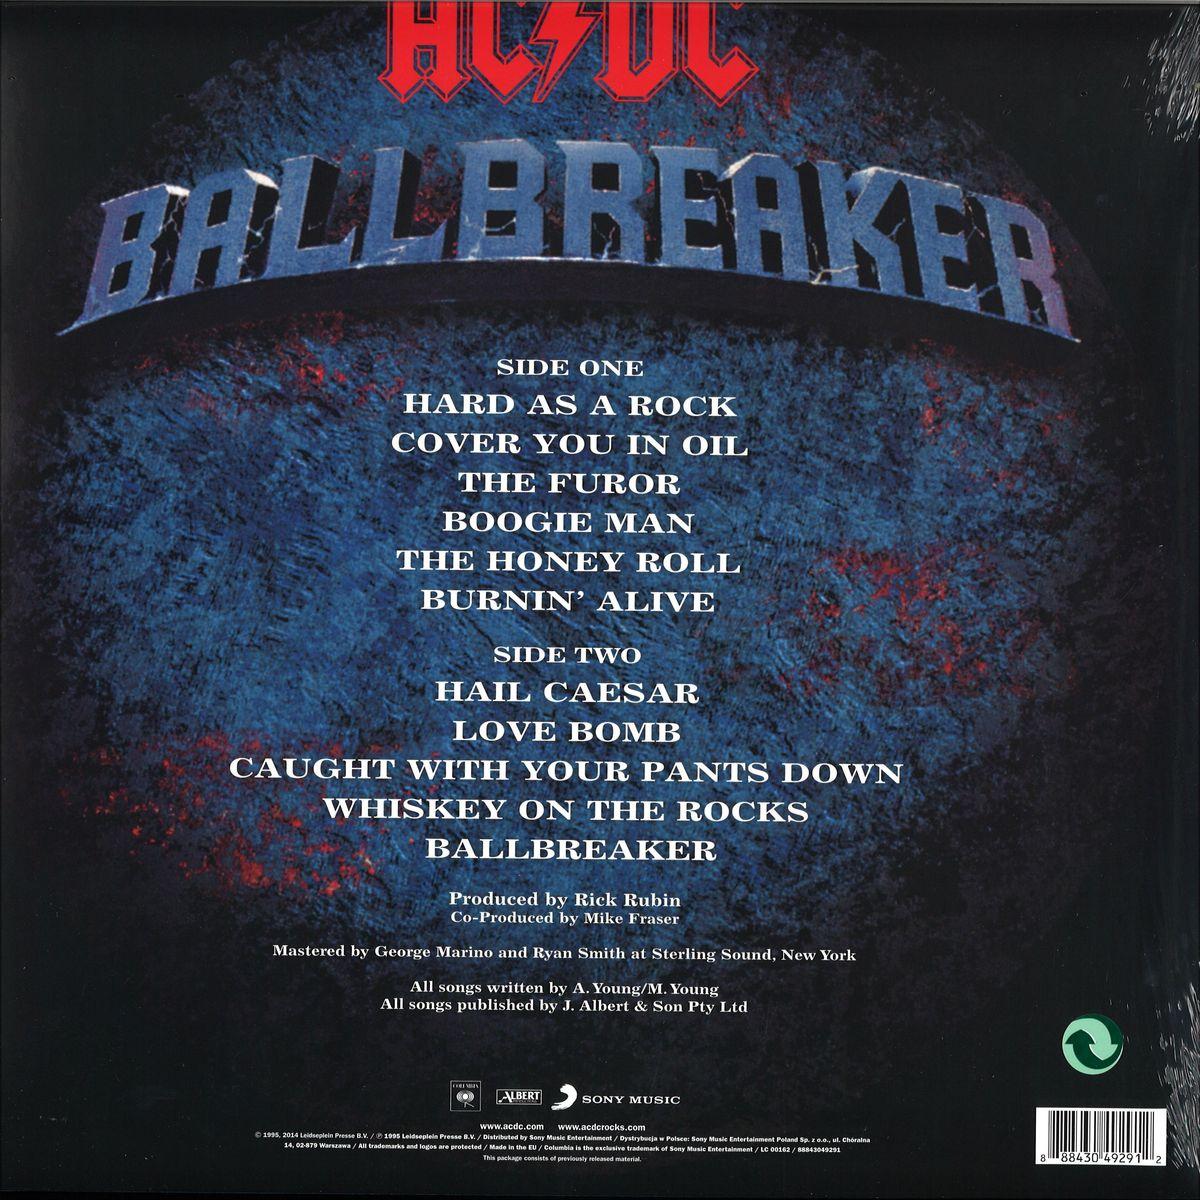 Ballbreaker Album Cover | www.pixshark.com - Images ...